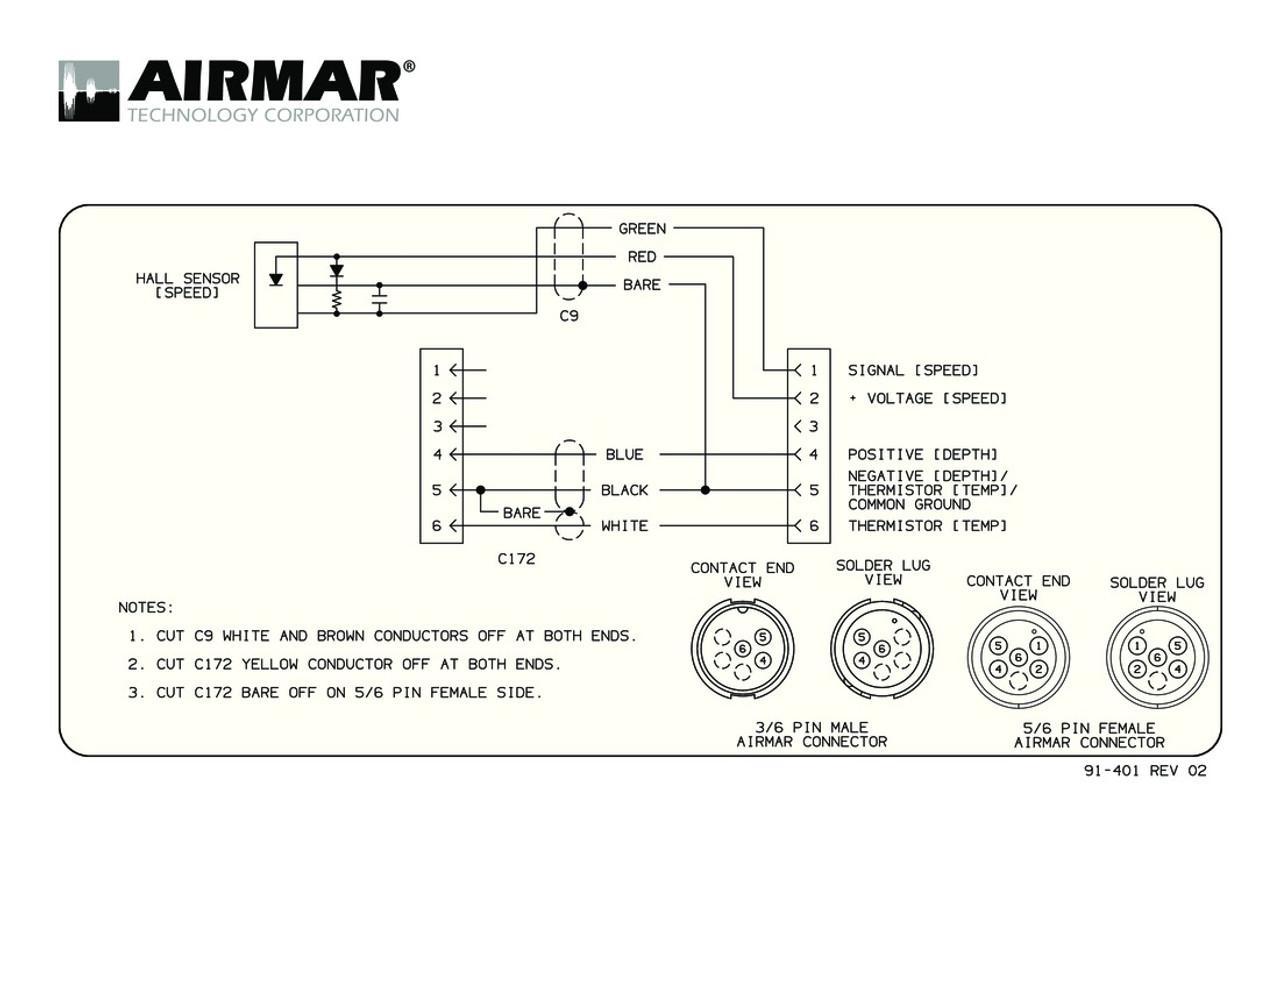 airmar wiring diagram garmin 6 pin s blue bottle marine garmin transducer wiring diagram 4 pin [ 1100 x 850 Pixel ]